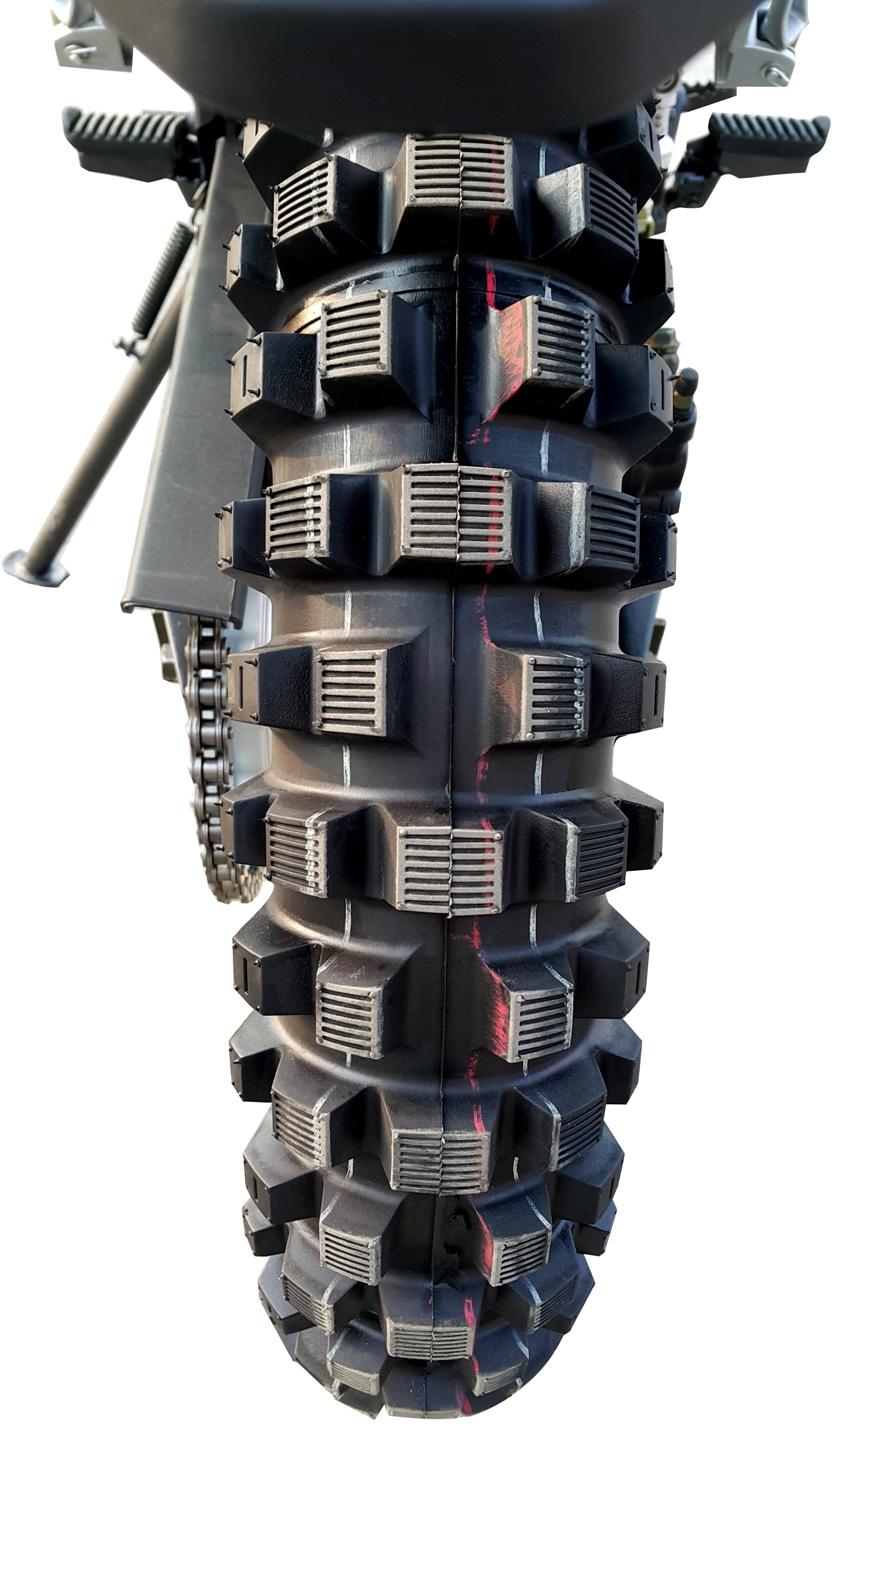 МОТОЦИКЛ SHINERAY XY 250GY-6B CROSS Black ― Артмото - купить квадроцикл в украине и харькове, мотоцикл, снегоход, скутер, мопед, электромобиль